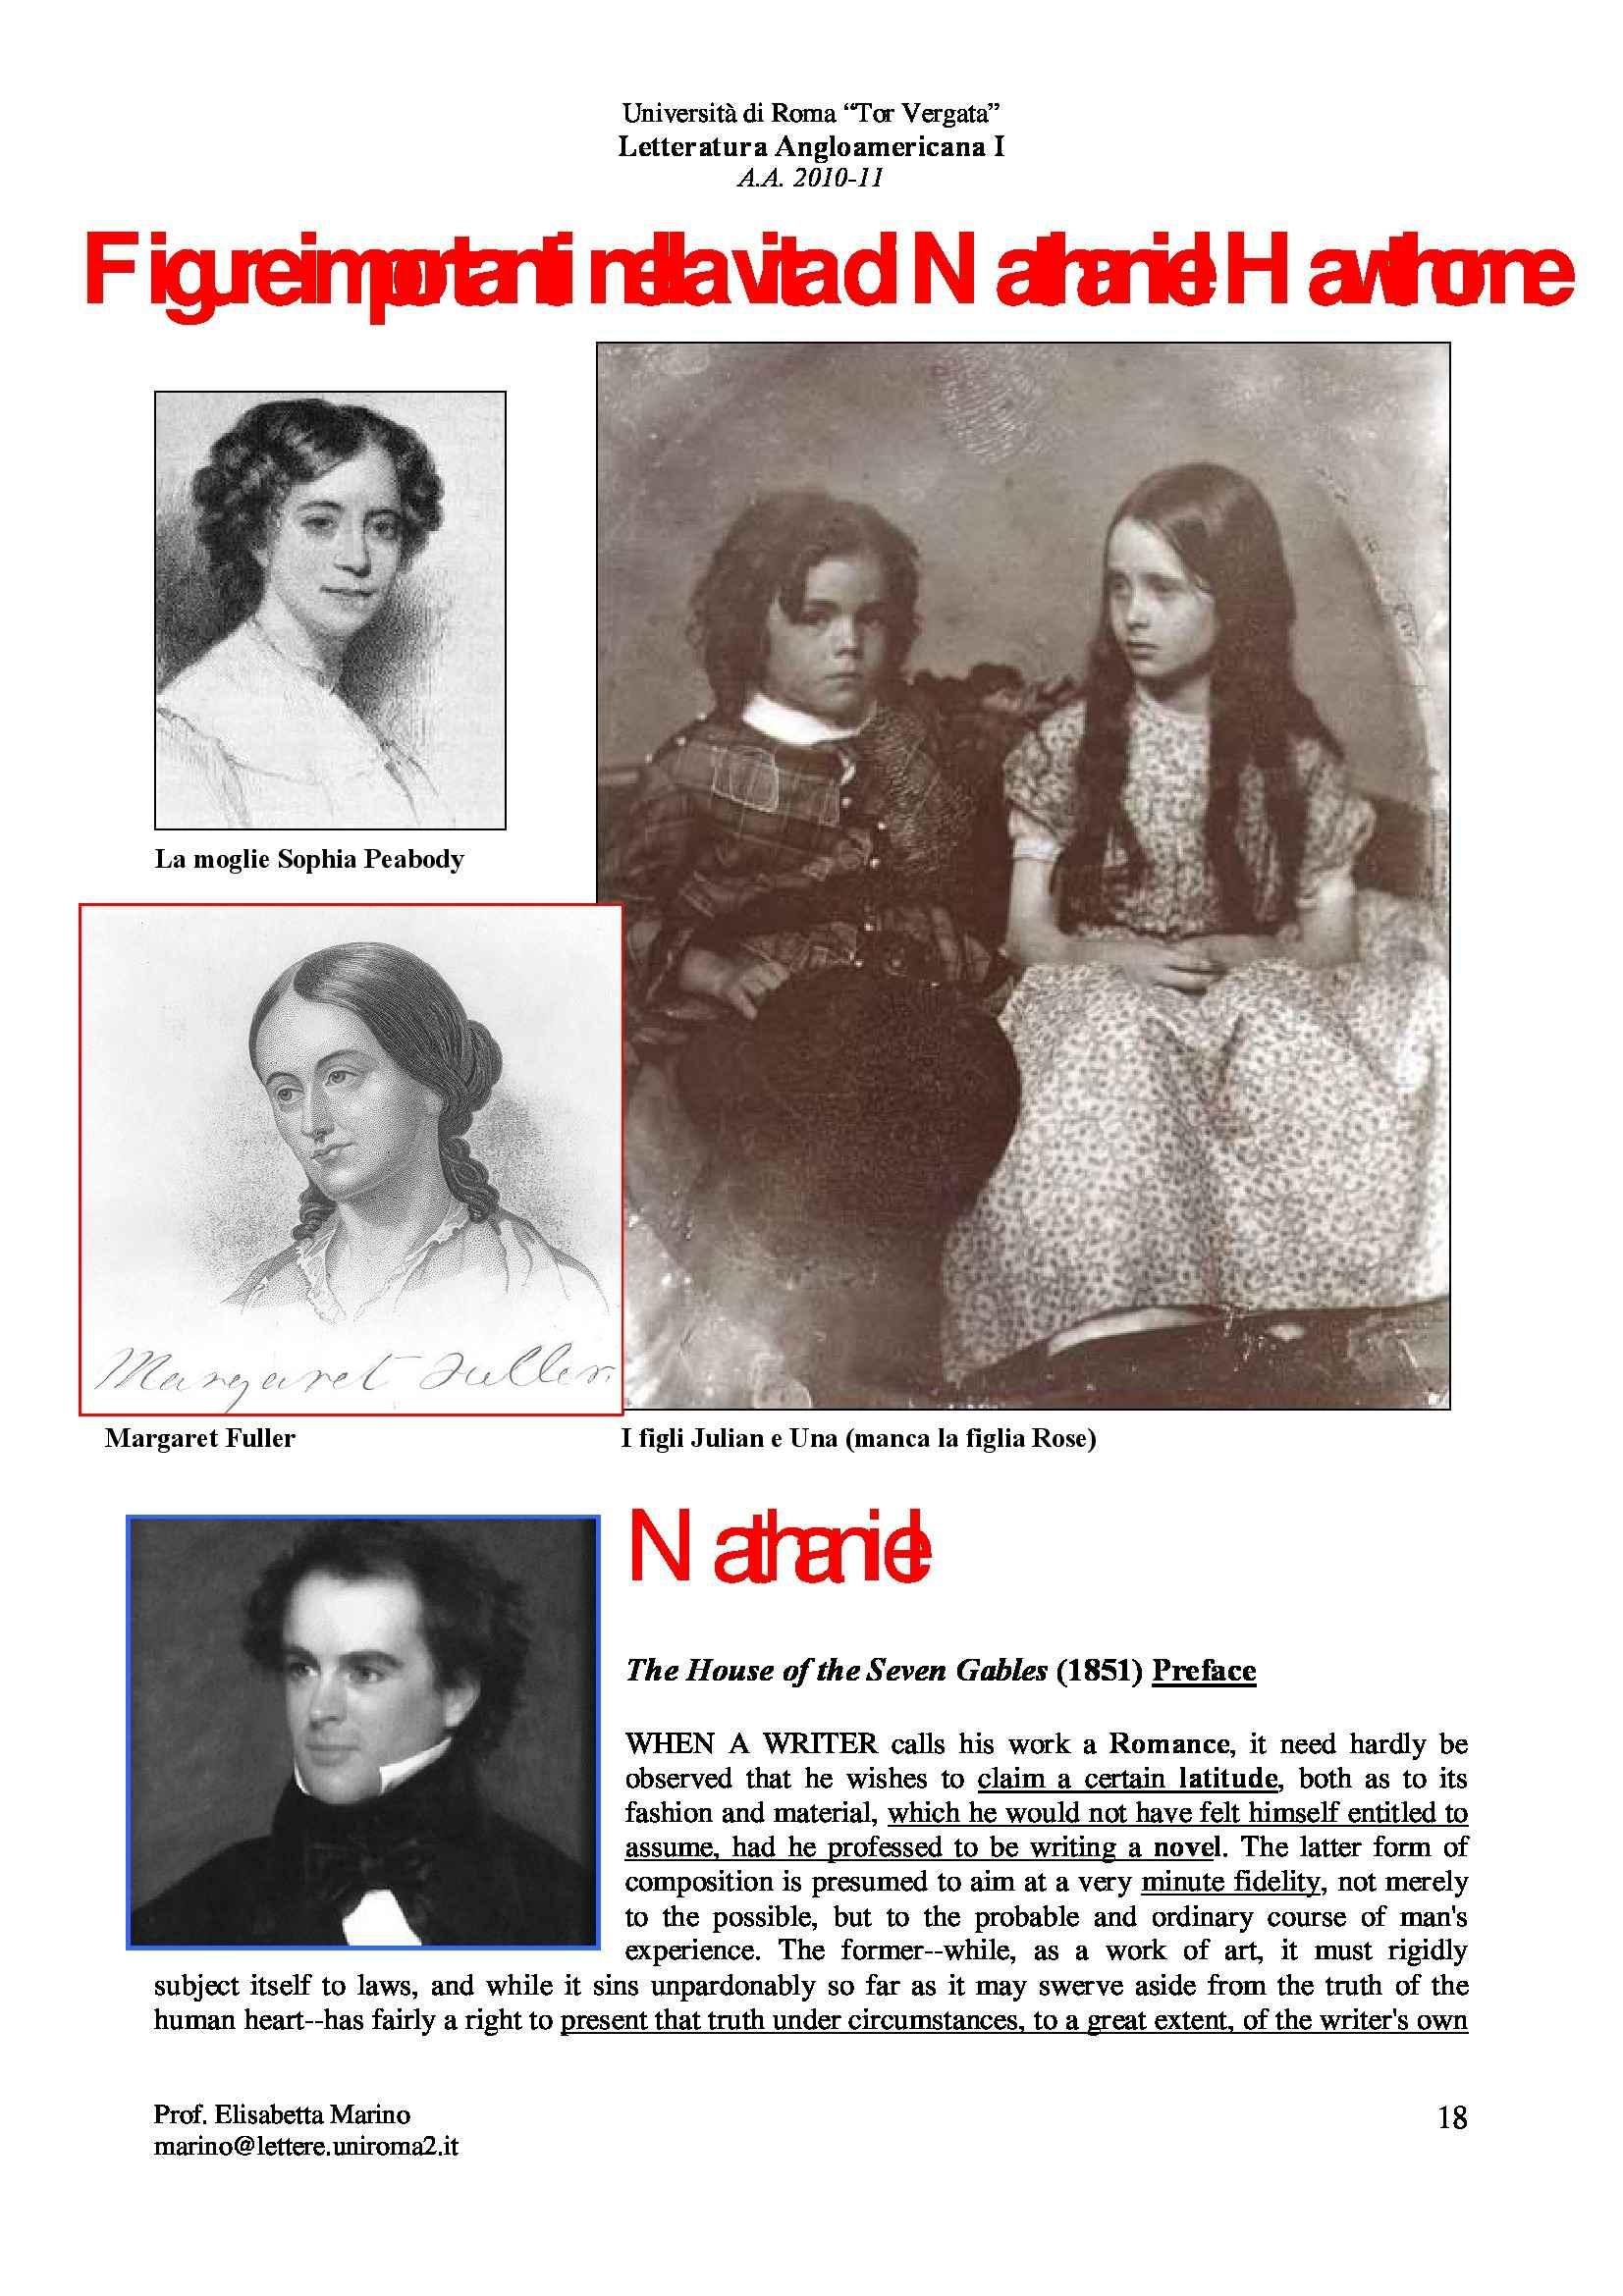 Letteratura anglo-americana I - Nathaniel Hawthorne